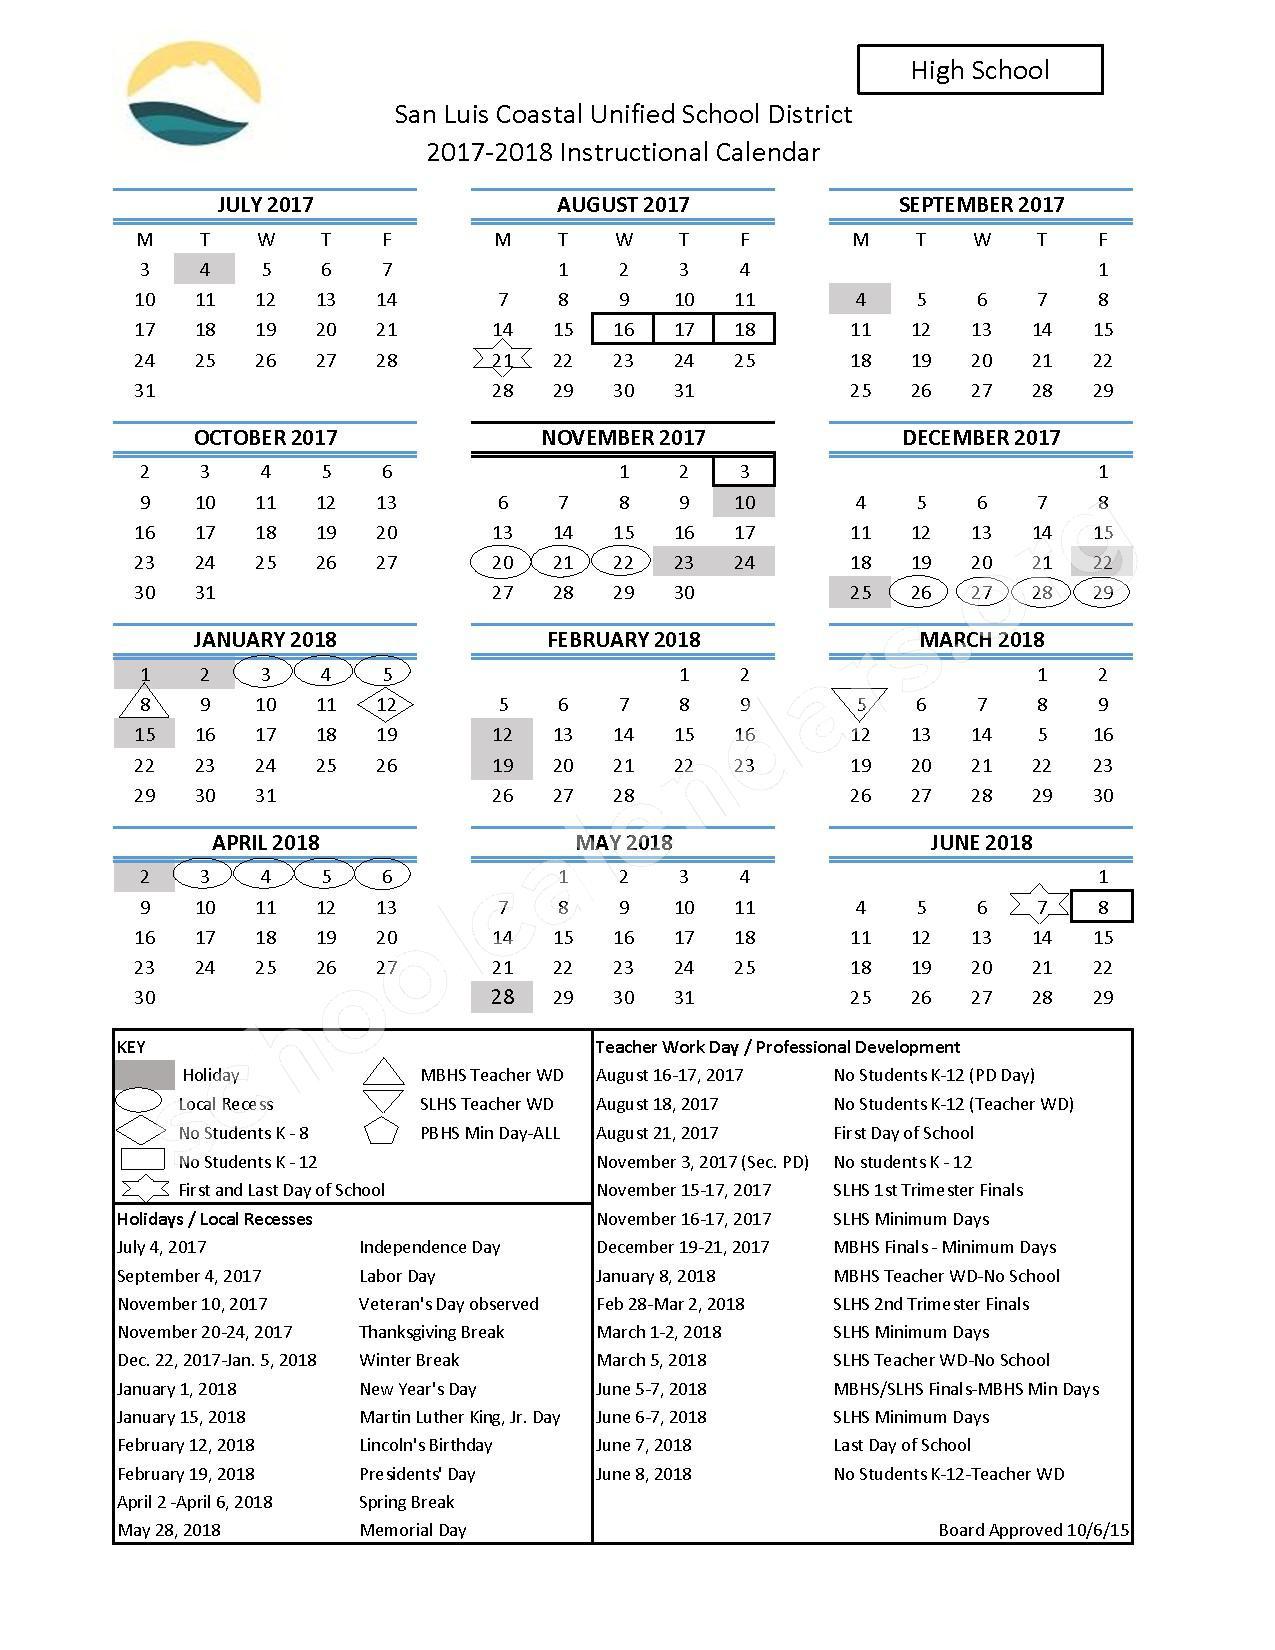 2017 - 2018 High School Calendar – San Luis Coastal Unified School District – page 1